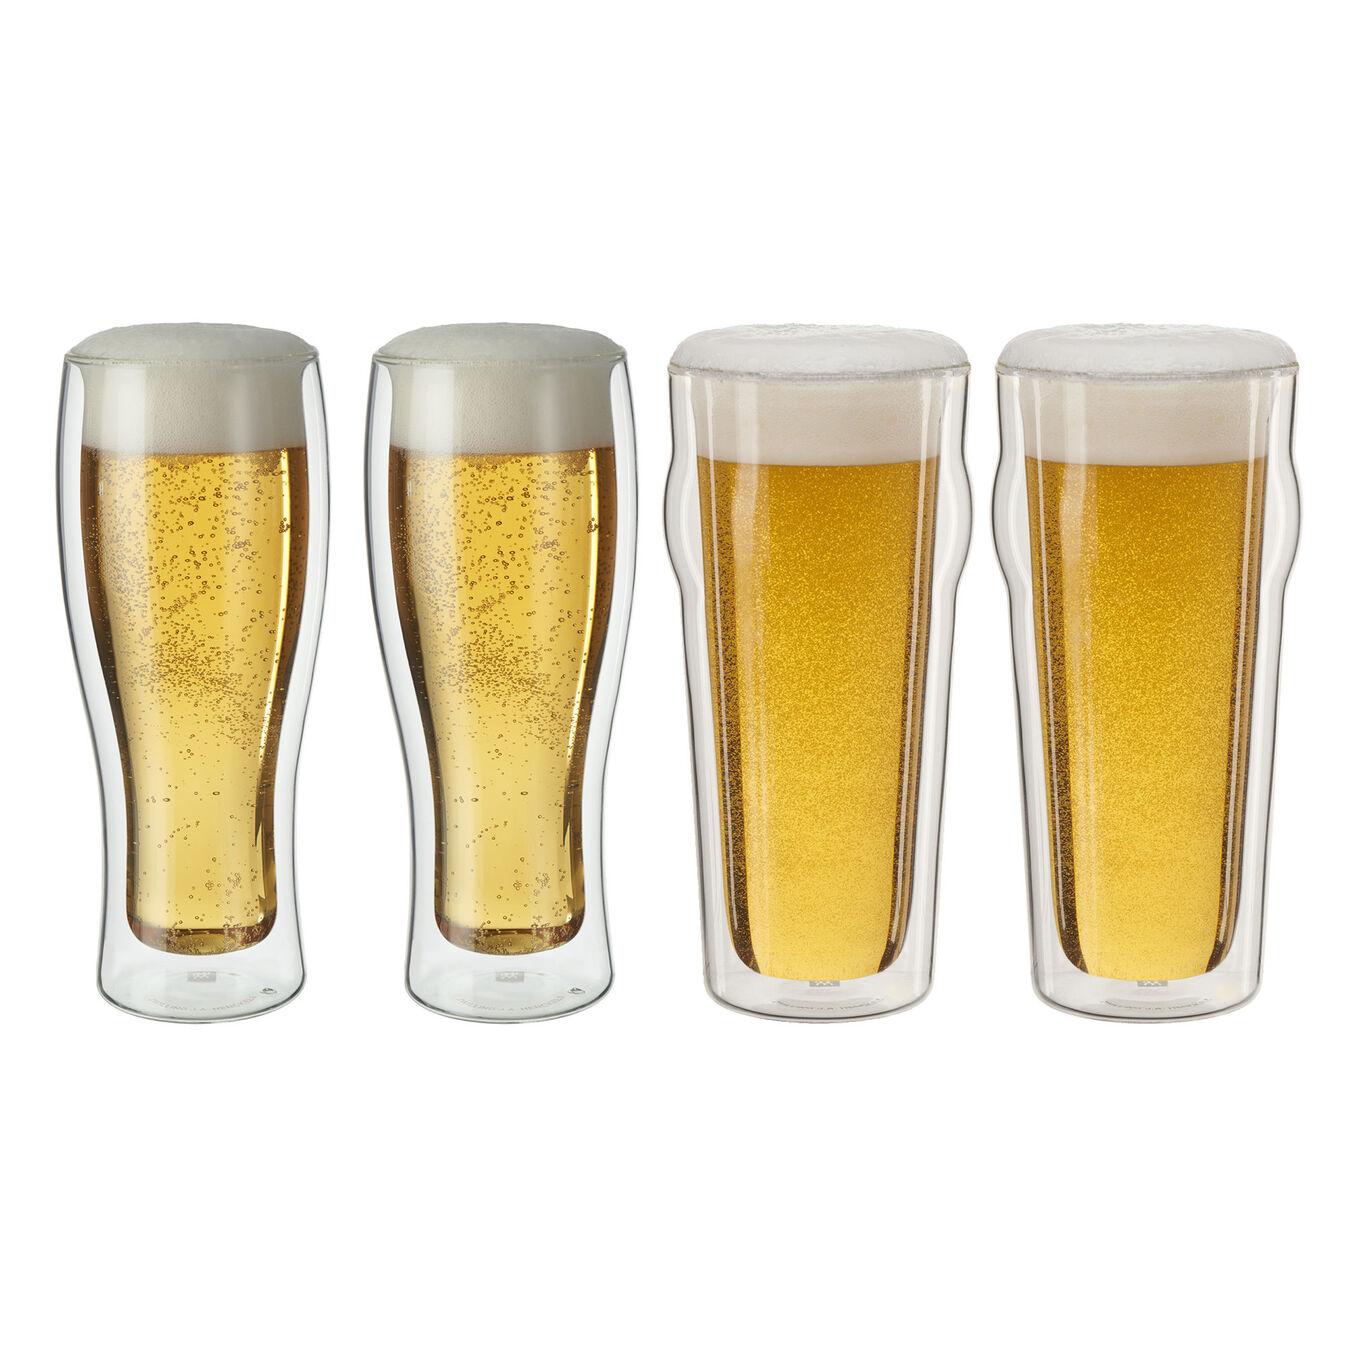 4 Piece Beer glass set,,large 1